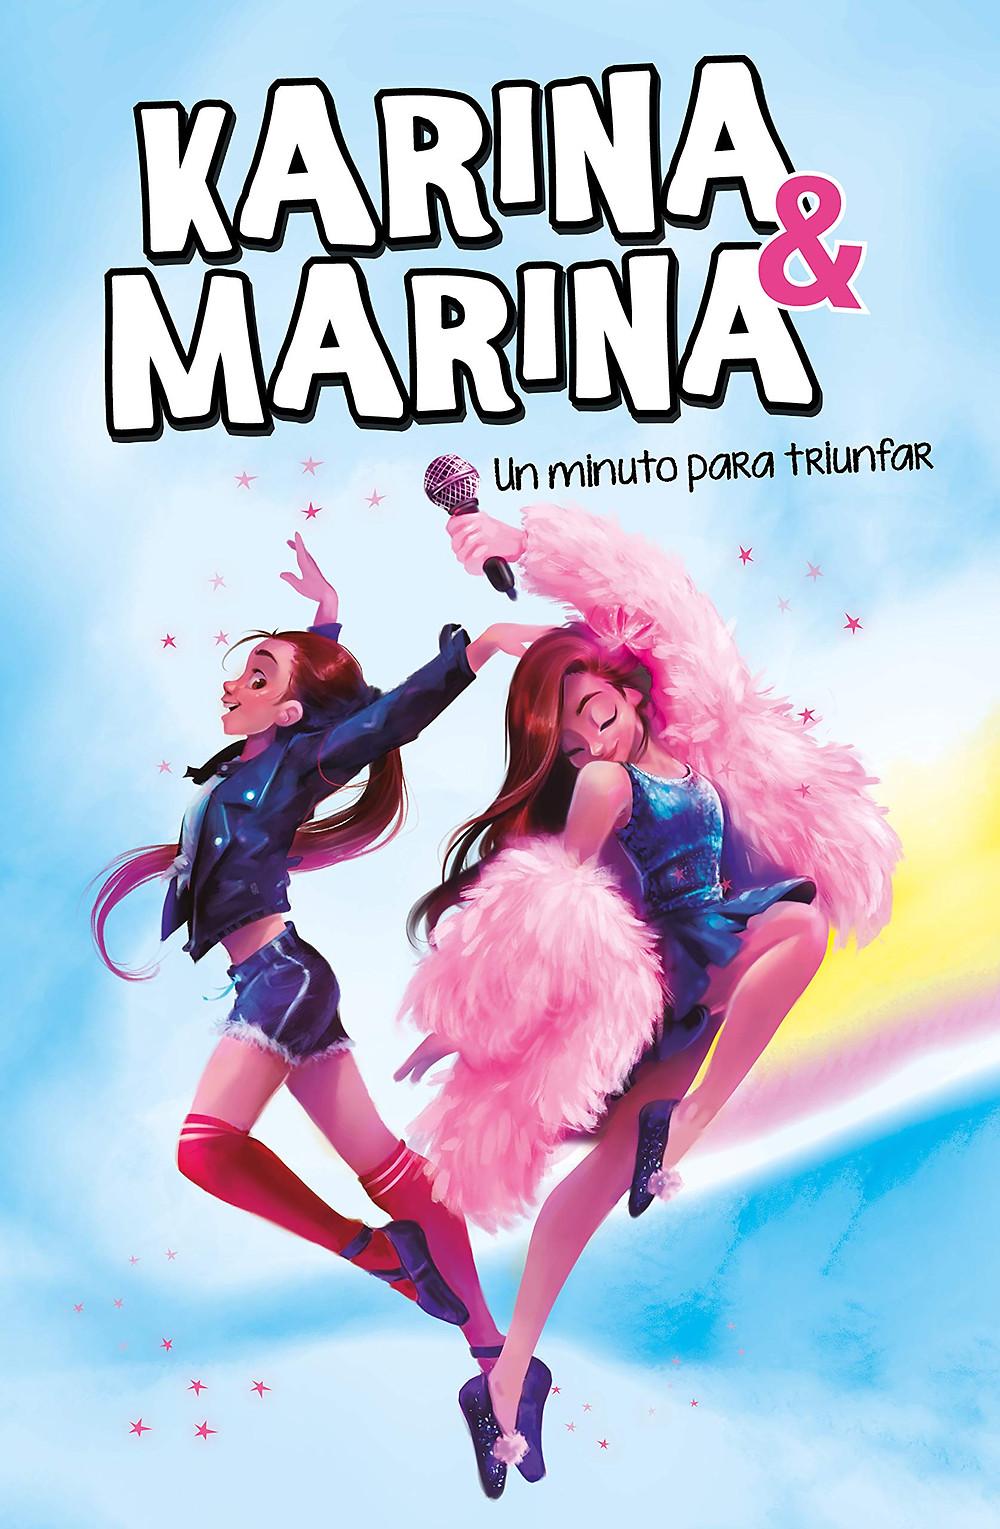 Karina y Marina, Un minuto para triunfar